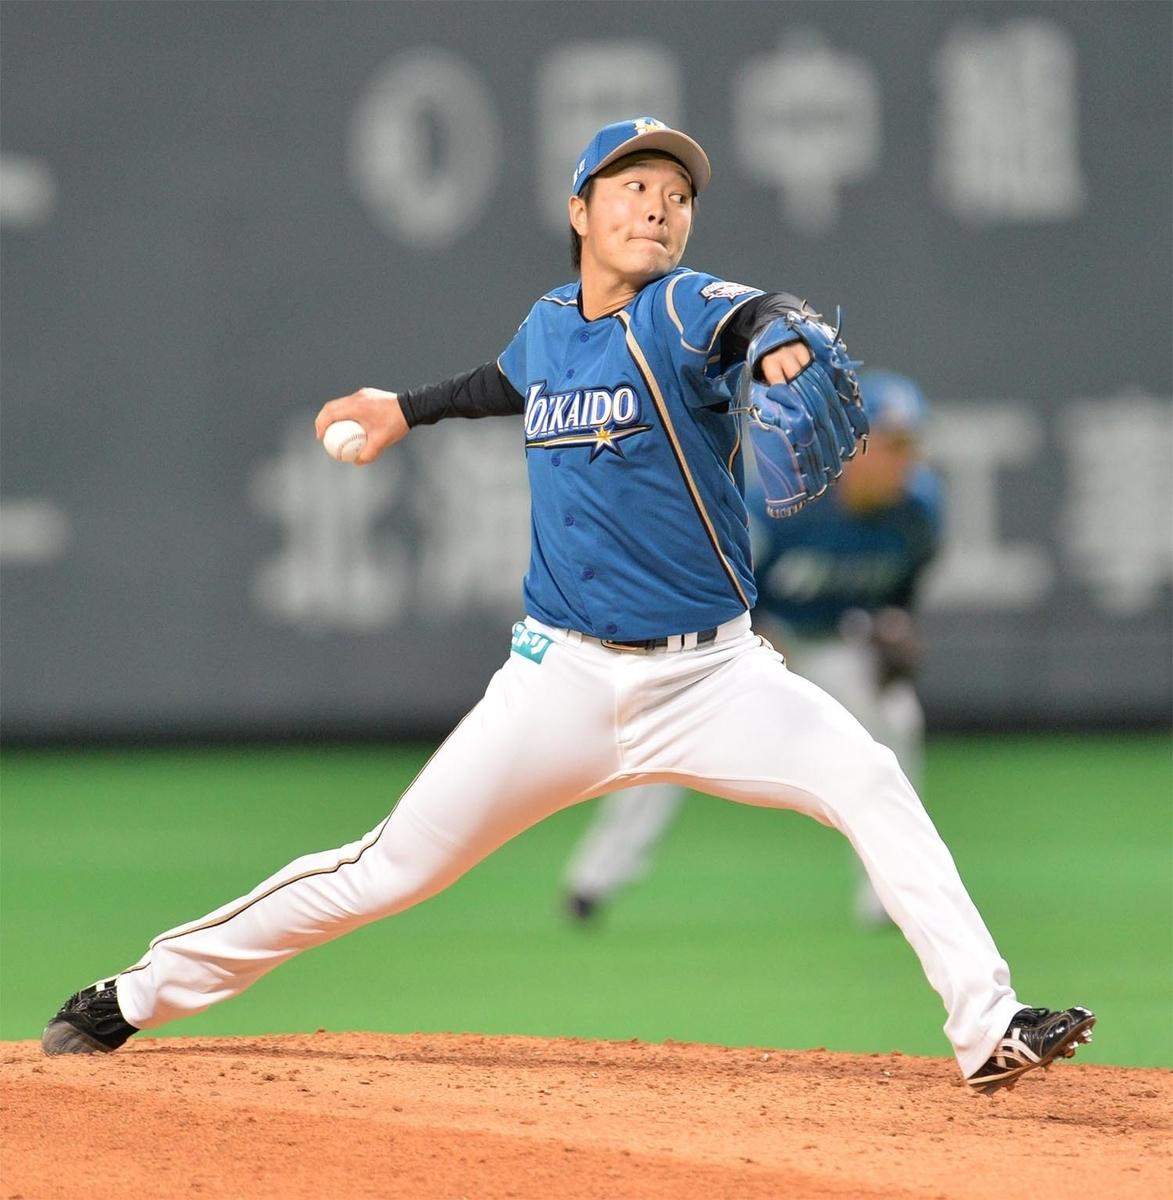 f:id:AriharaOkoku:20200712104642j:plain